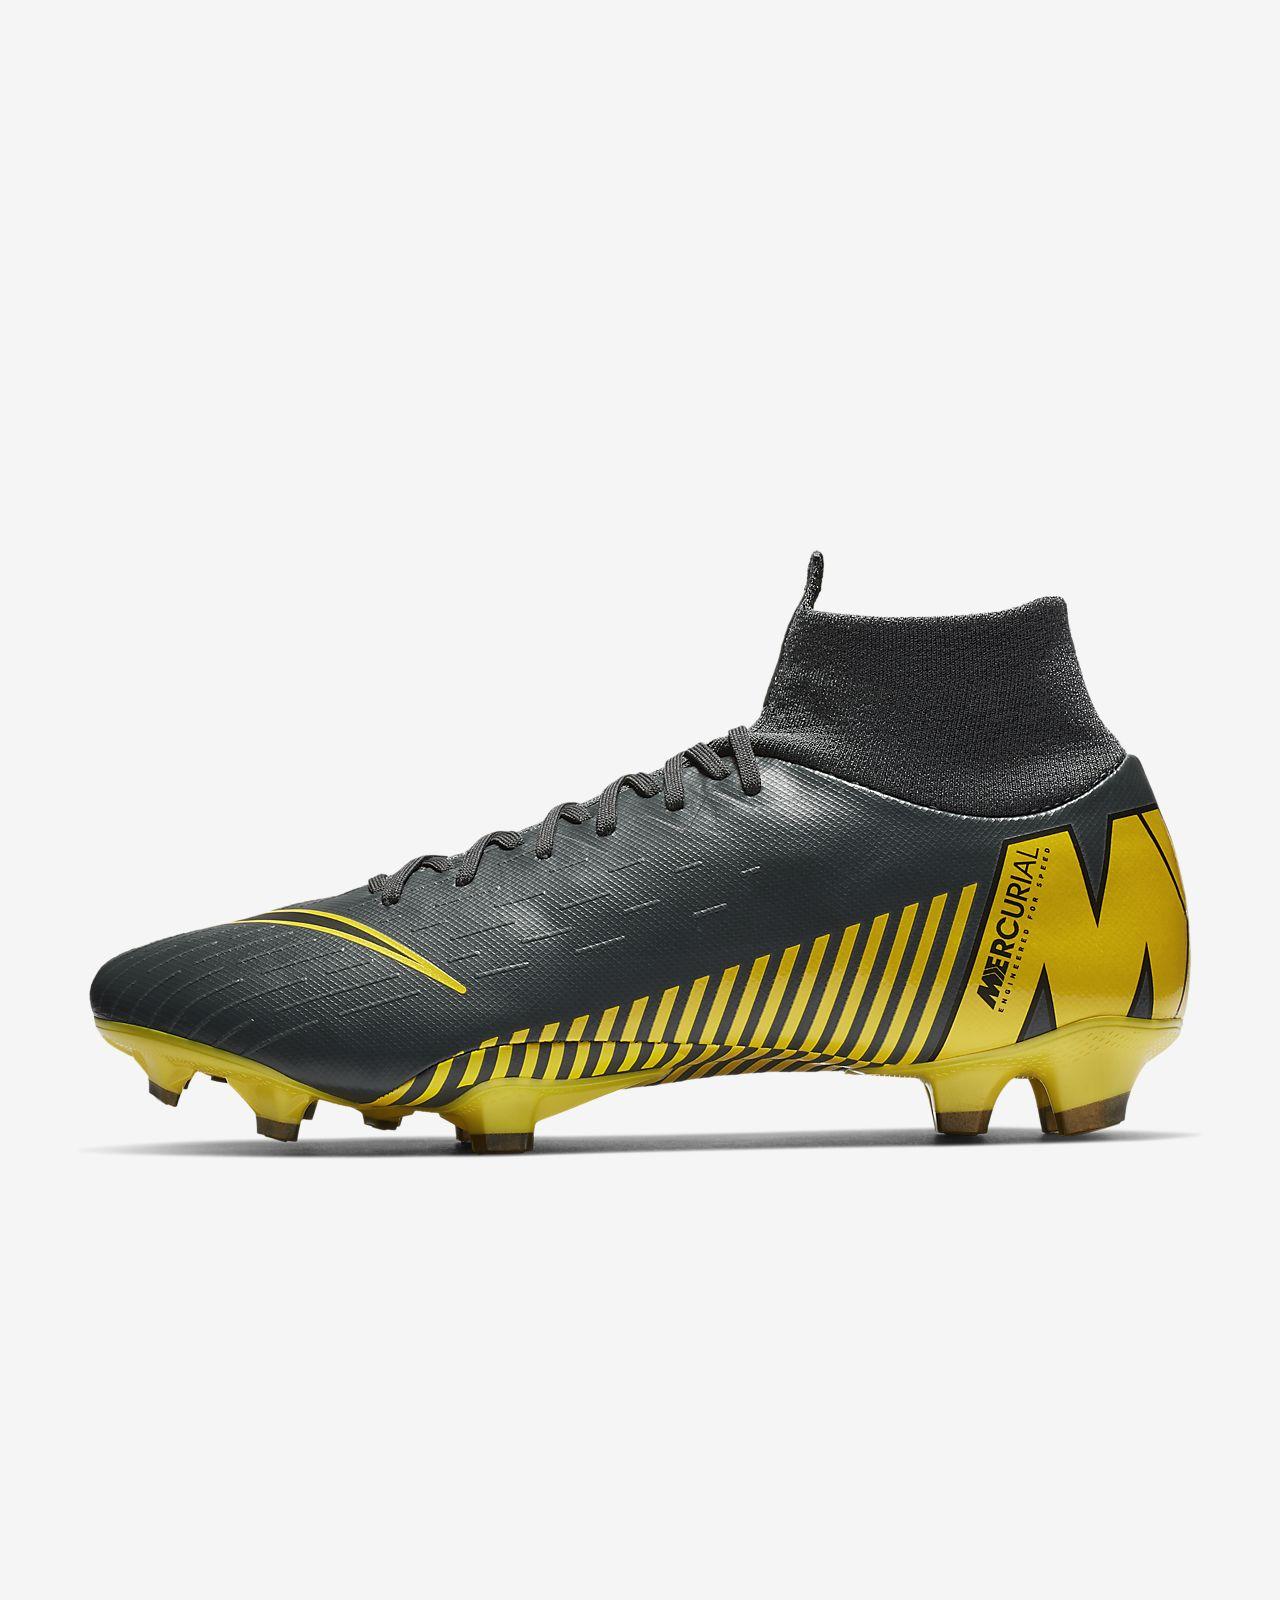 quality design 29a29 97dbc ... Chaussure de football à crampons pour terrain sec Nike Superfly 6 Pro FG